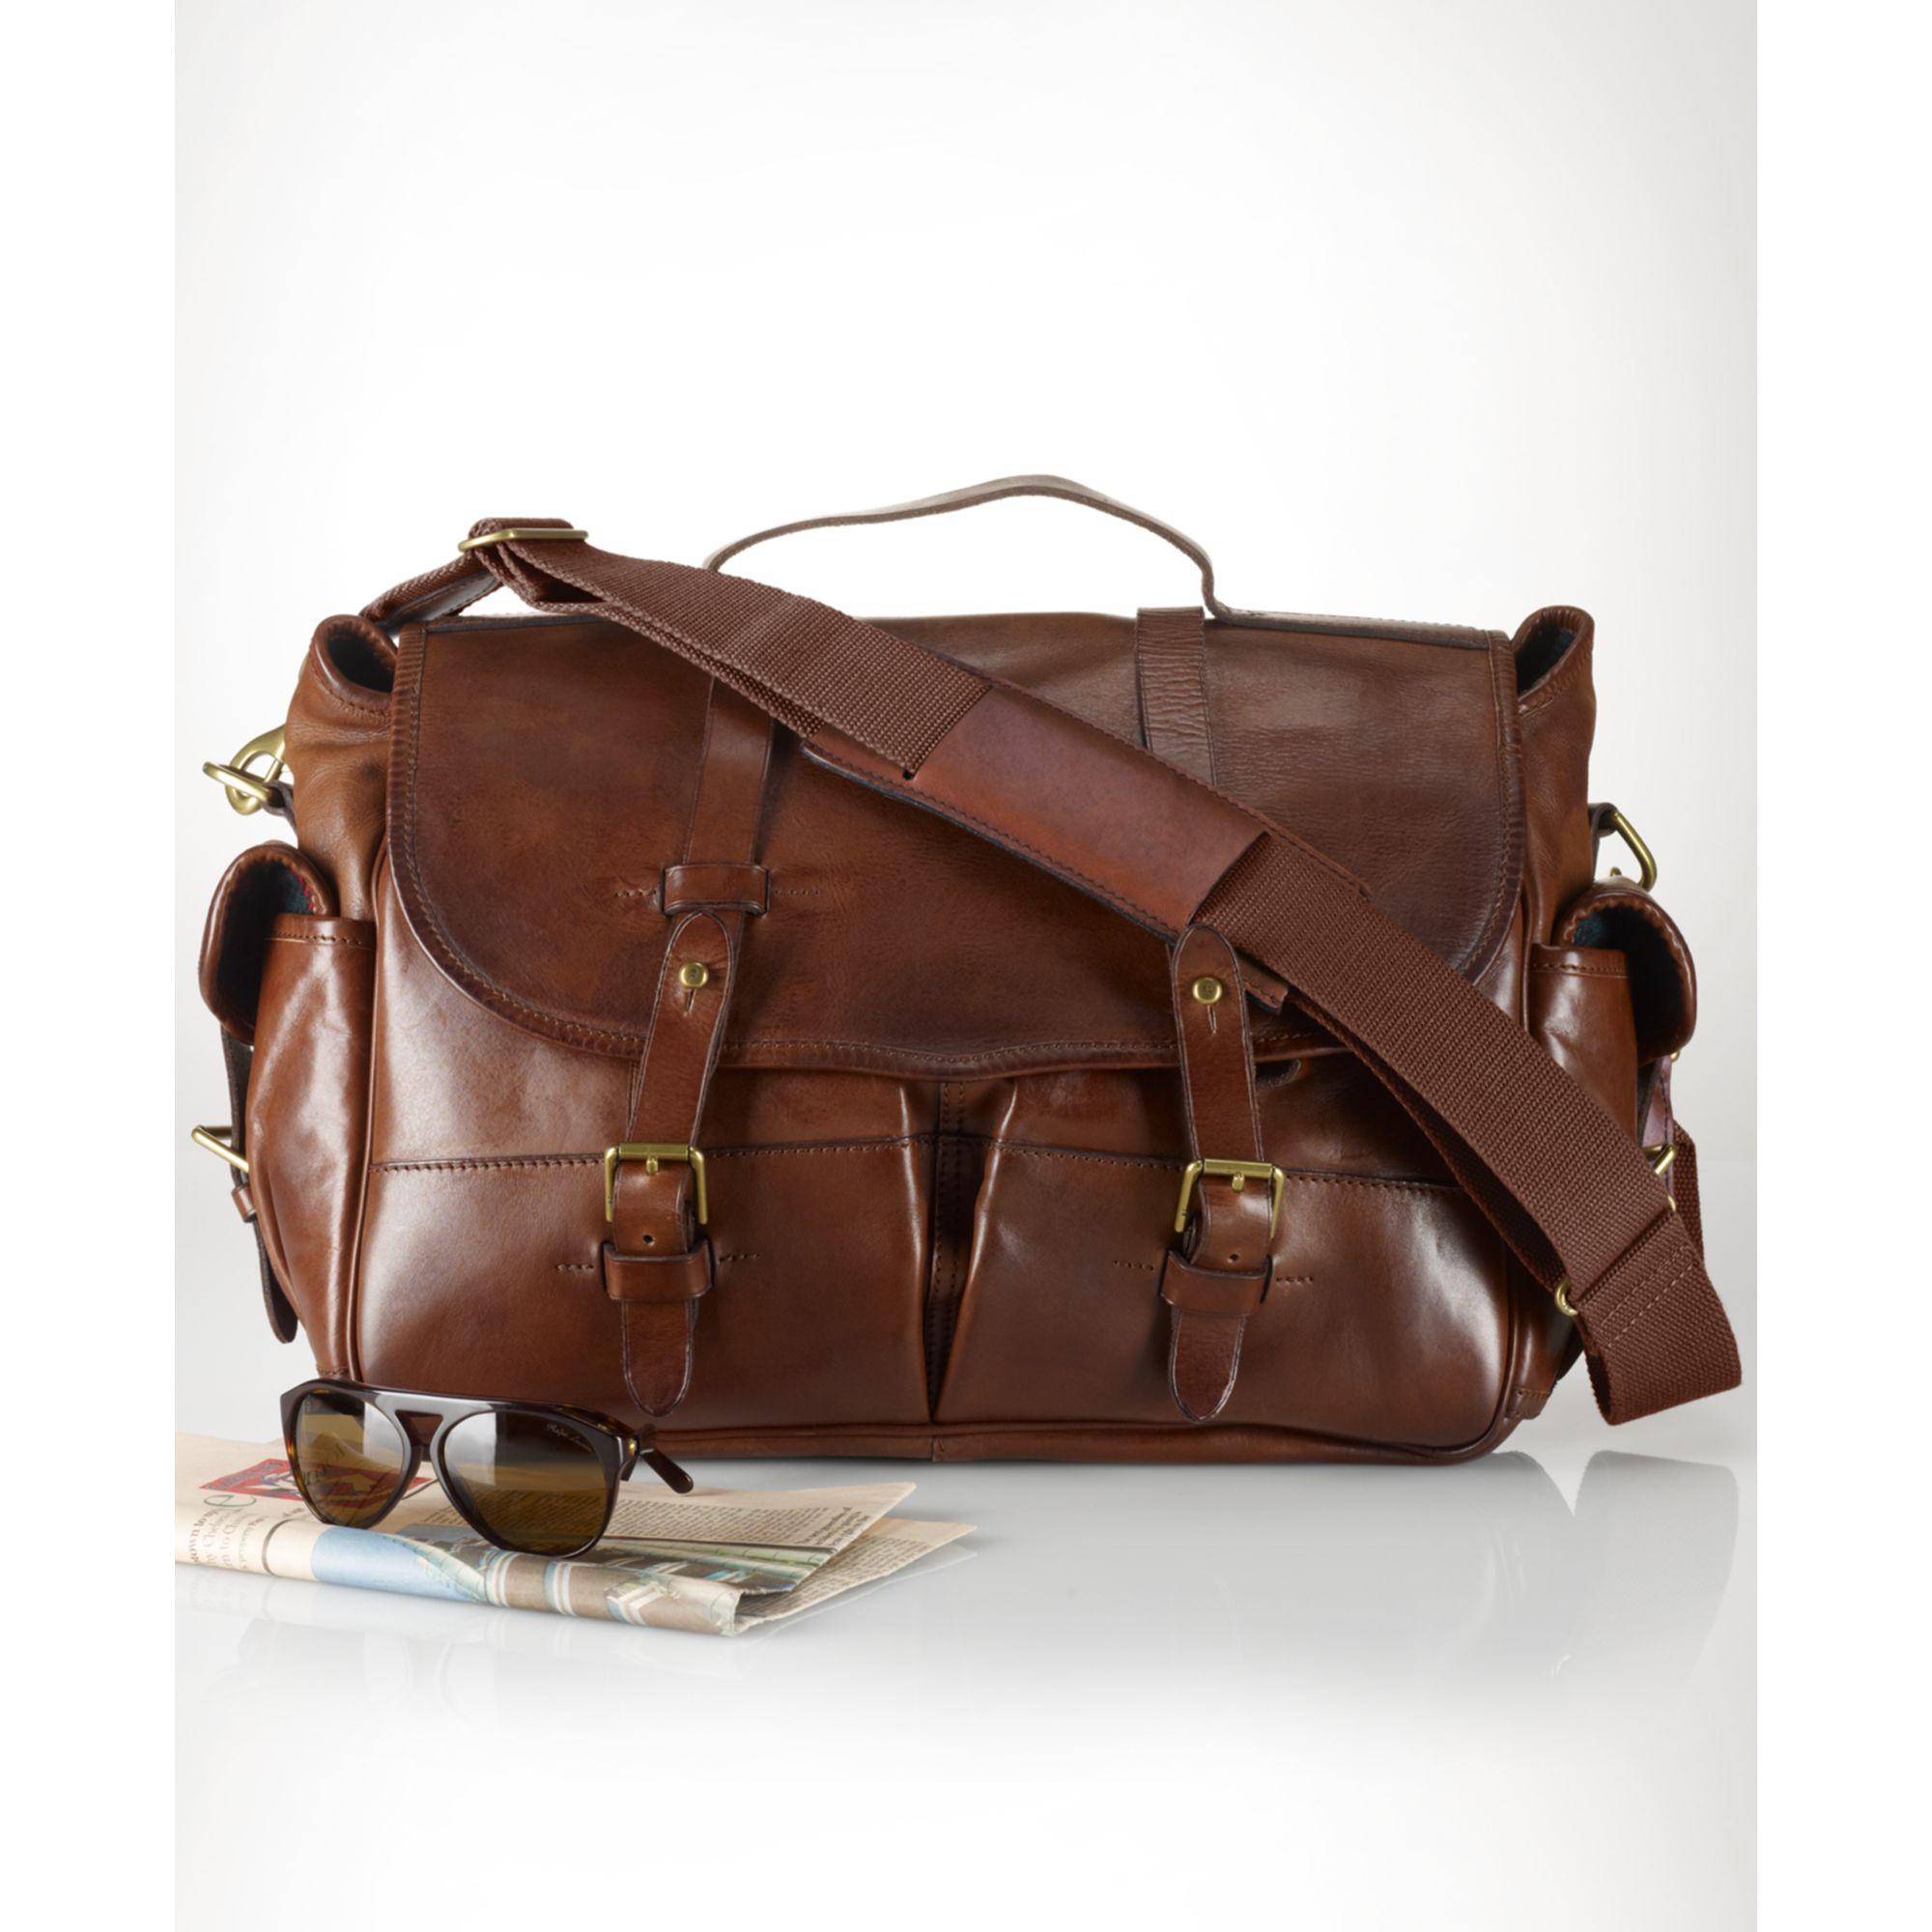 b3d719f8b36c Lyst - Ralph Lauren Leather Messenger Bag in Brown for Men